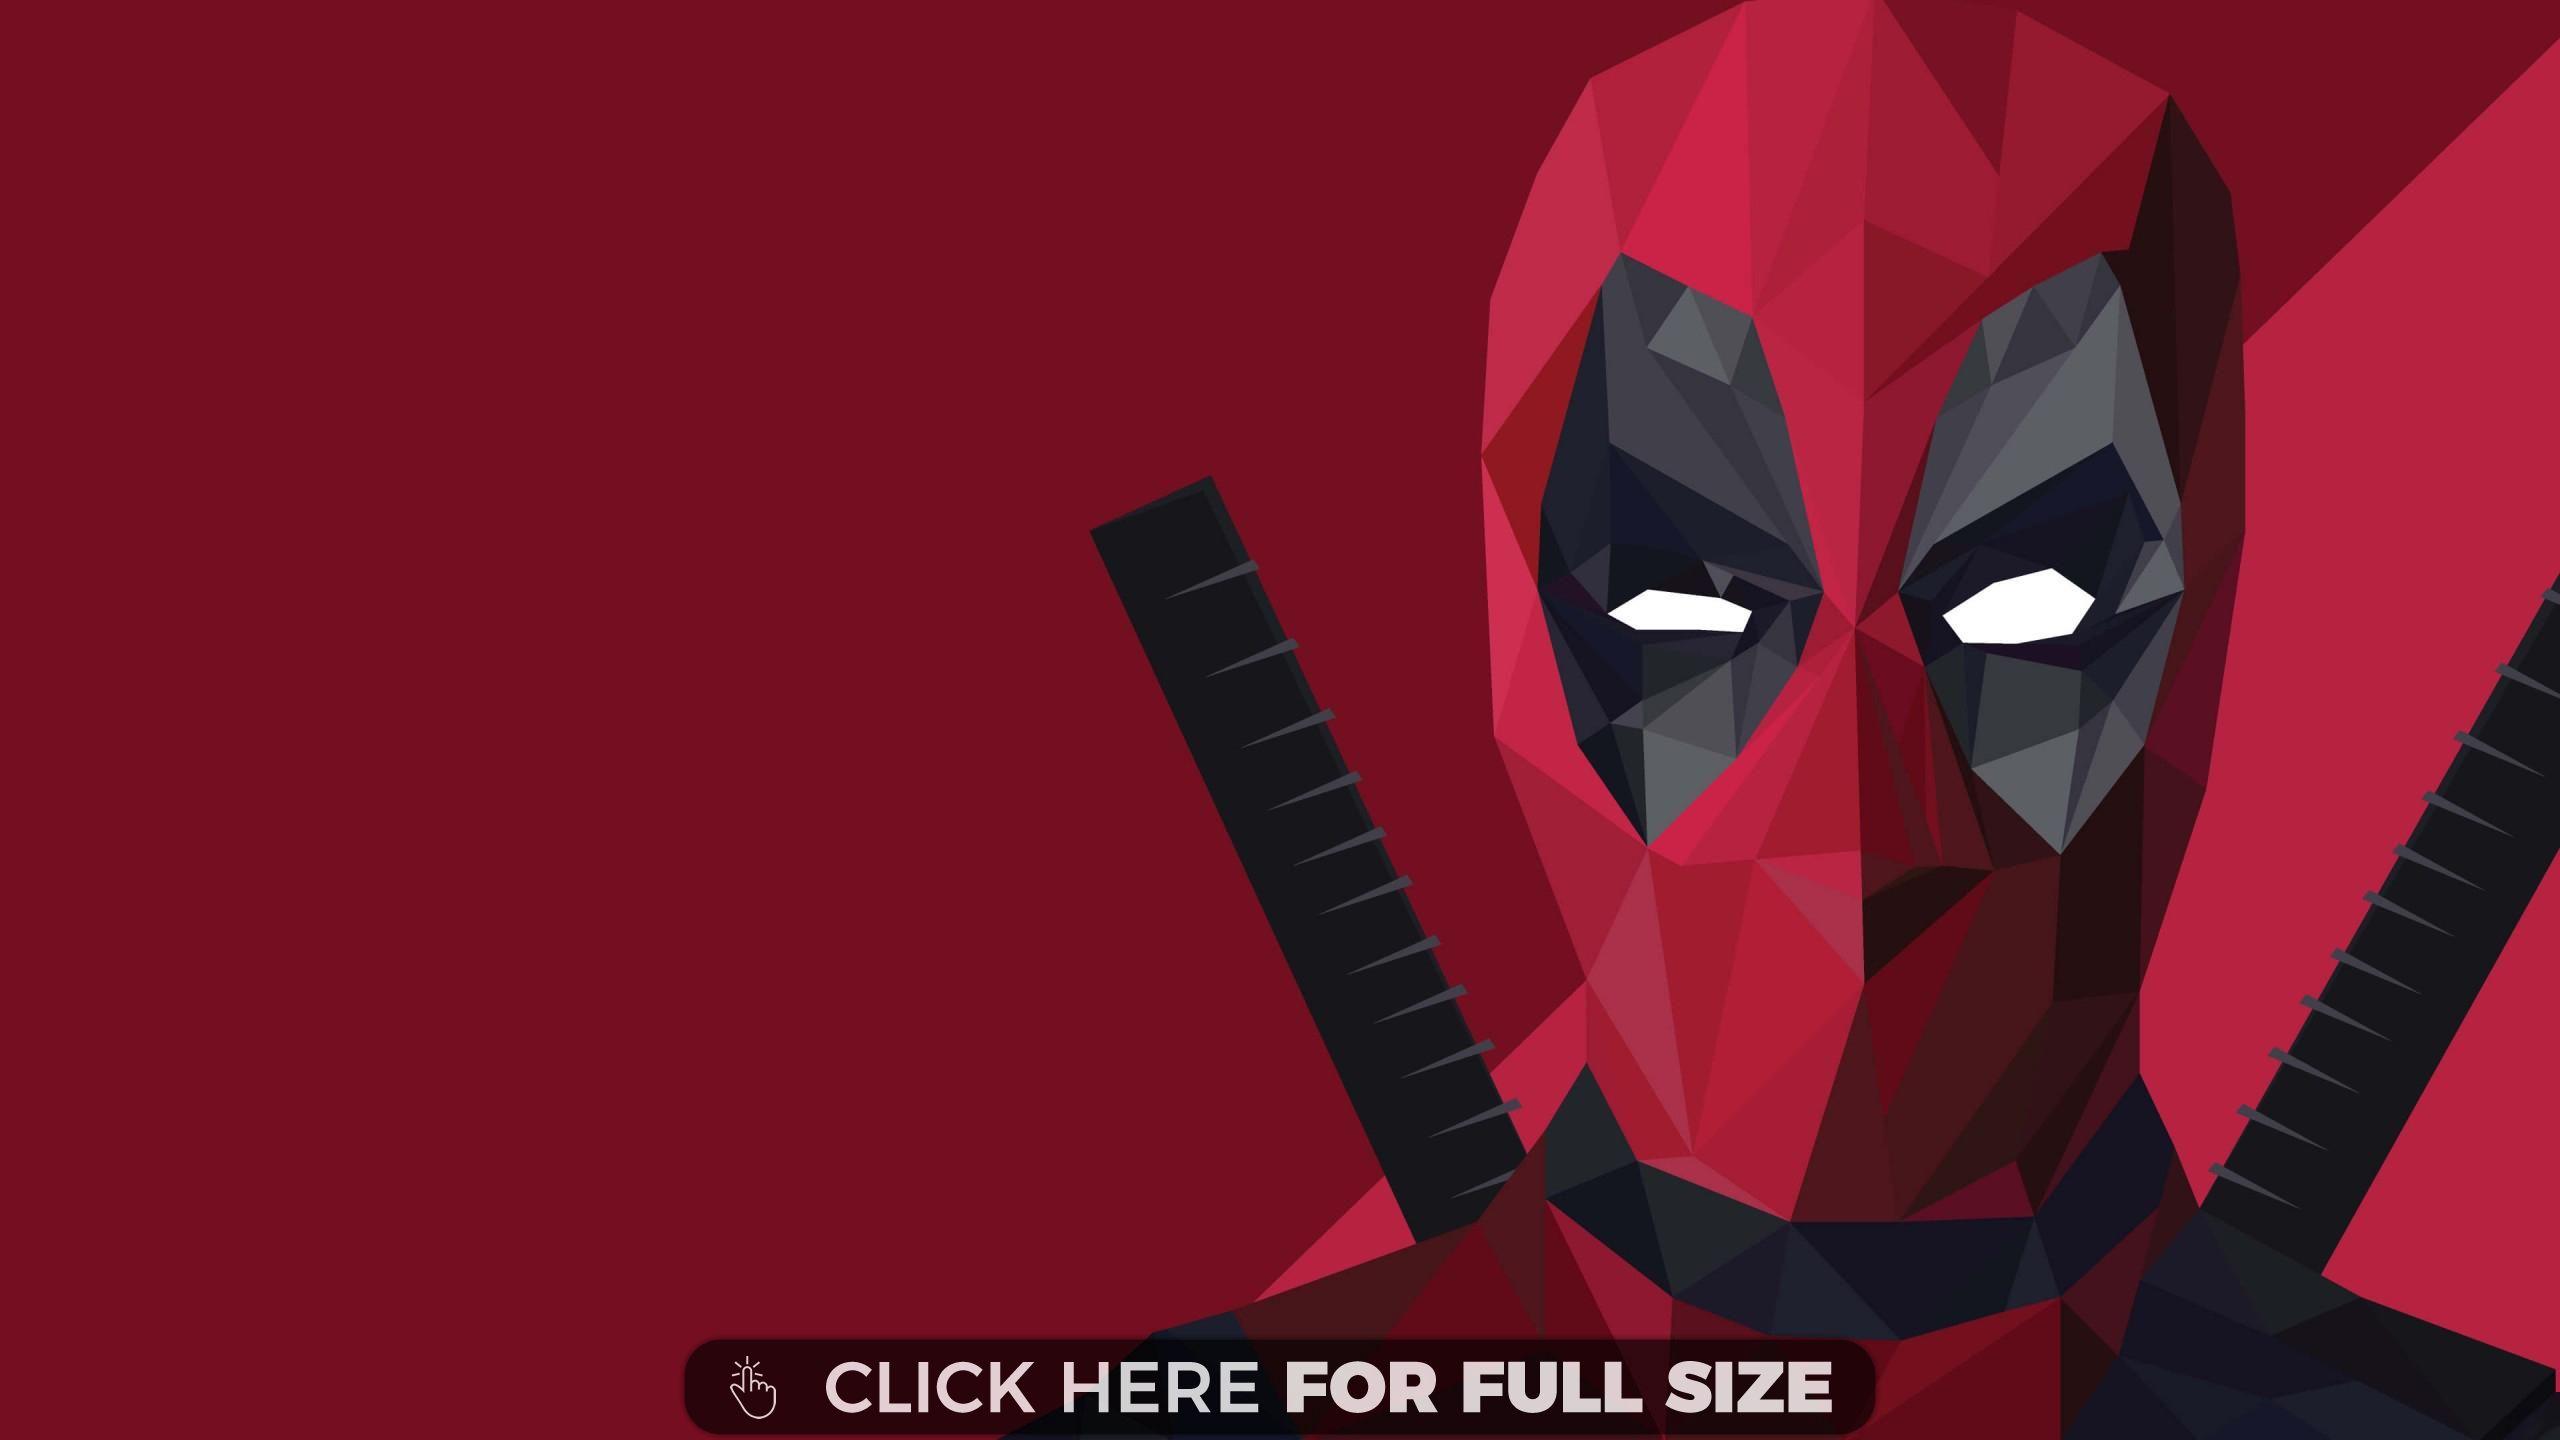 Deadpool Hd Wallpaper Deadpool Wallpaper Desktop Deadpool Wallpaper Deadpool Hd Wallpaper